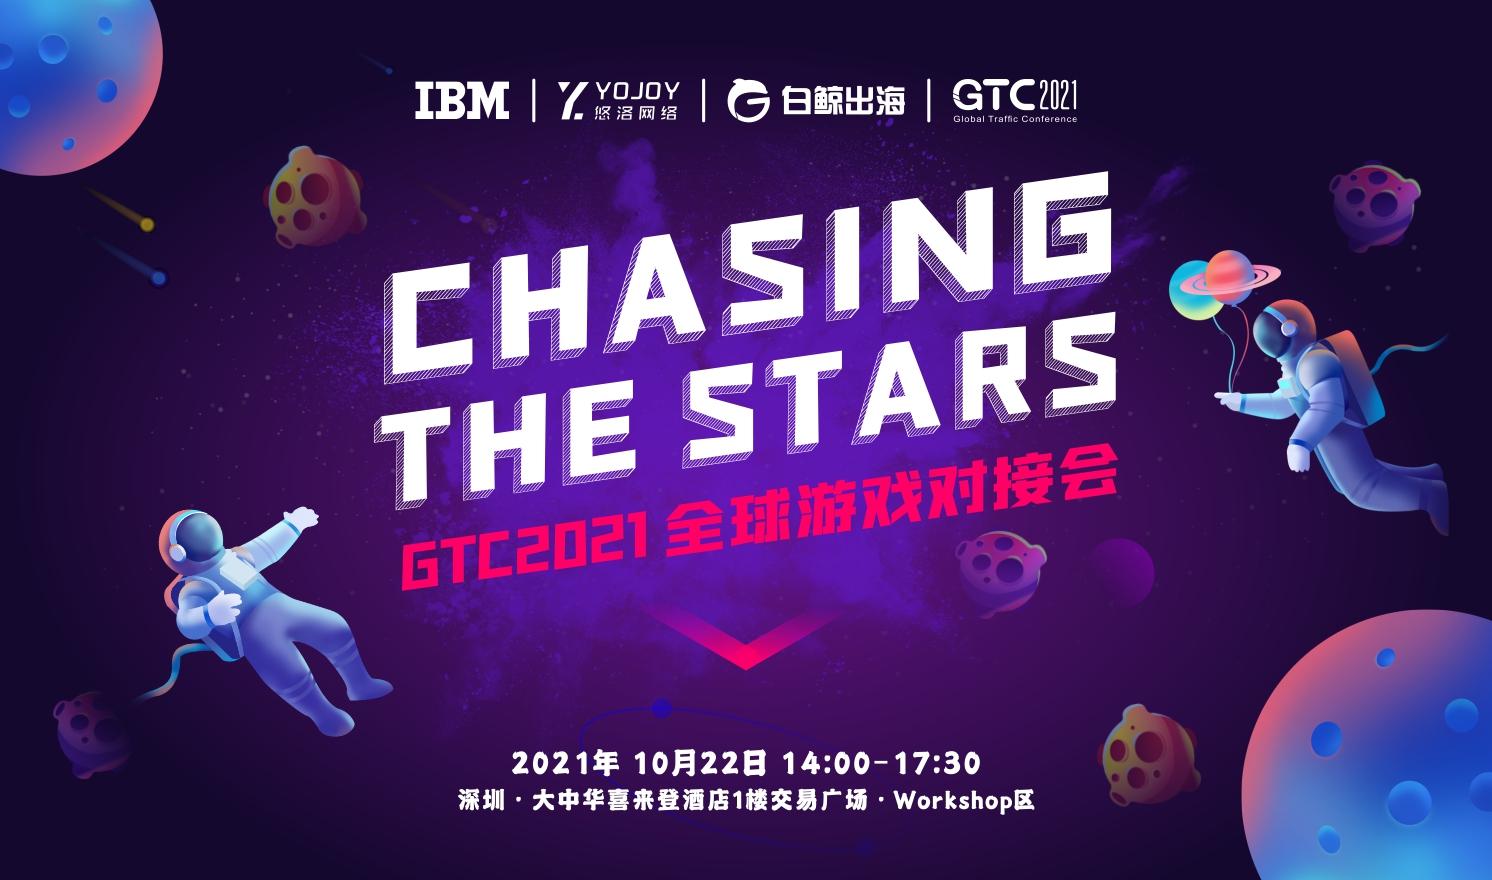 GTC2021全球流量大会—CHASING THE STARS全球游戏对接会(2021-10-22)